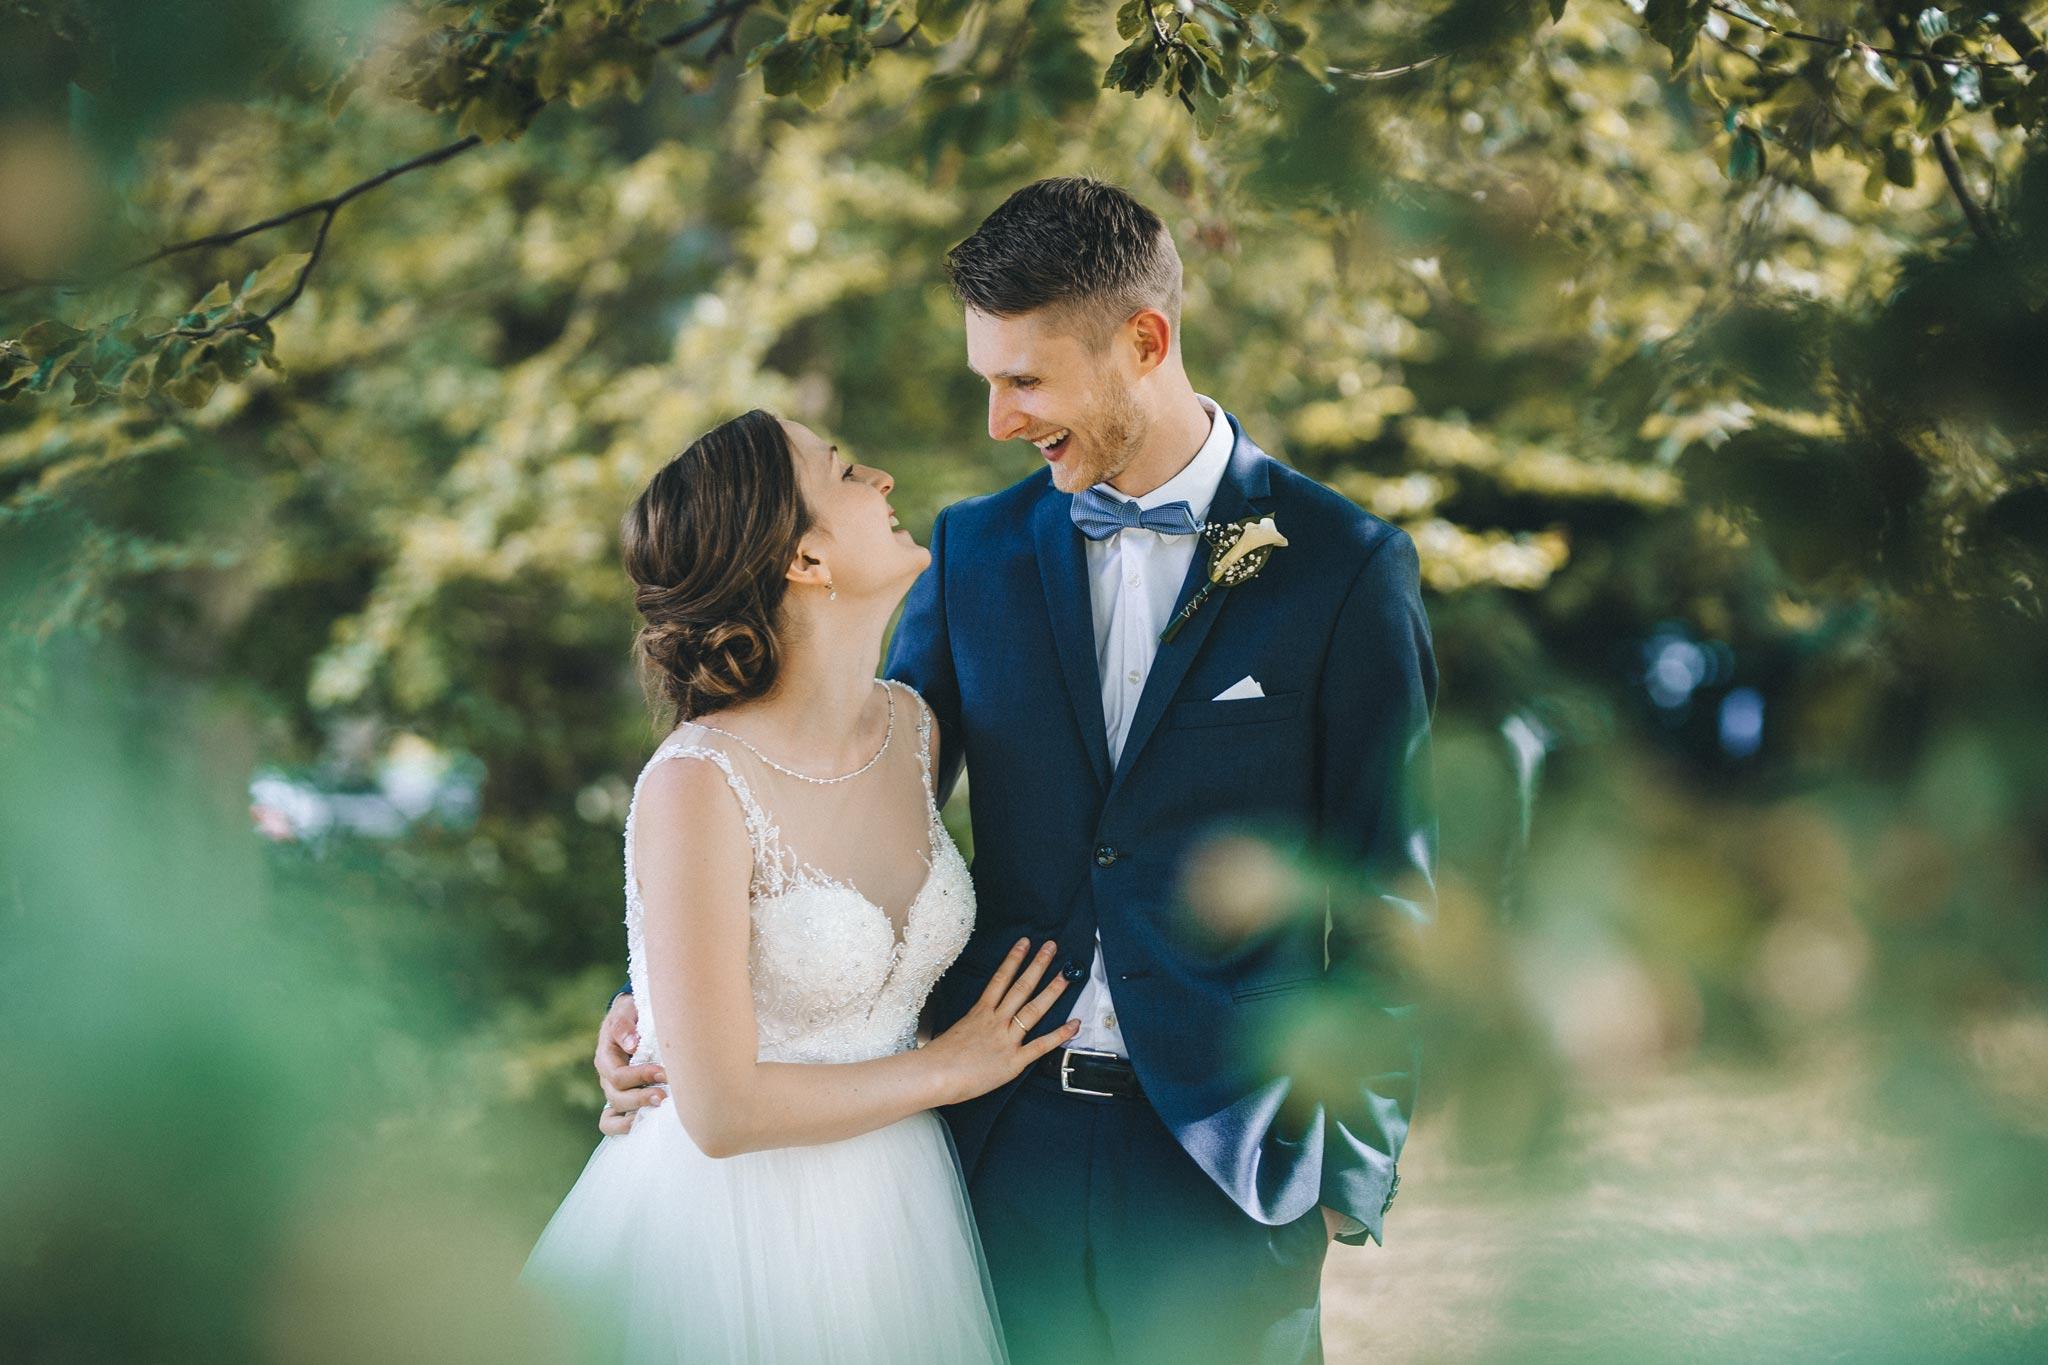 Bryllupper og privatfoto